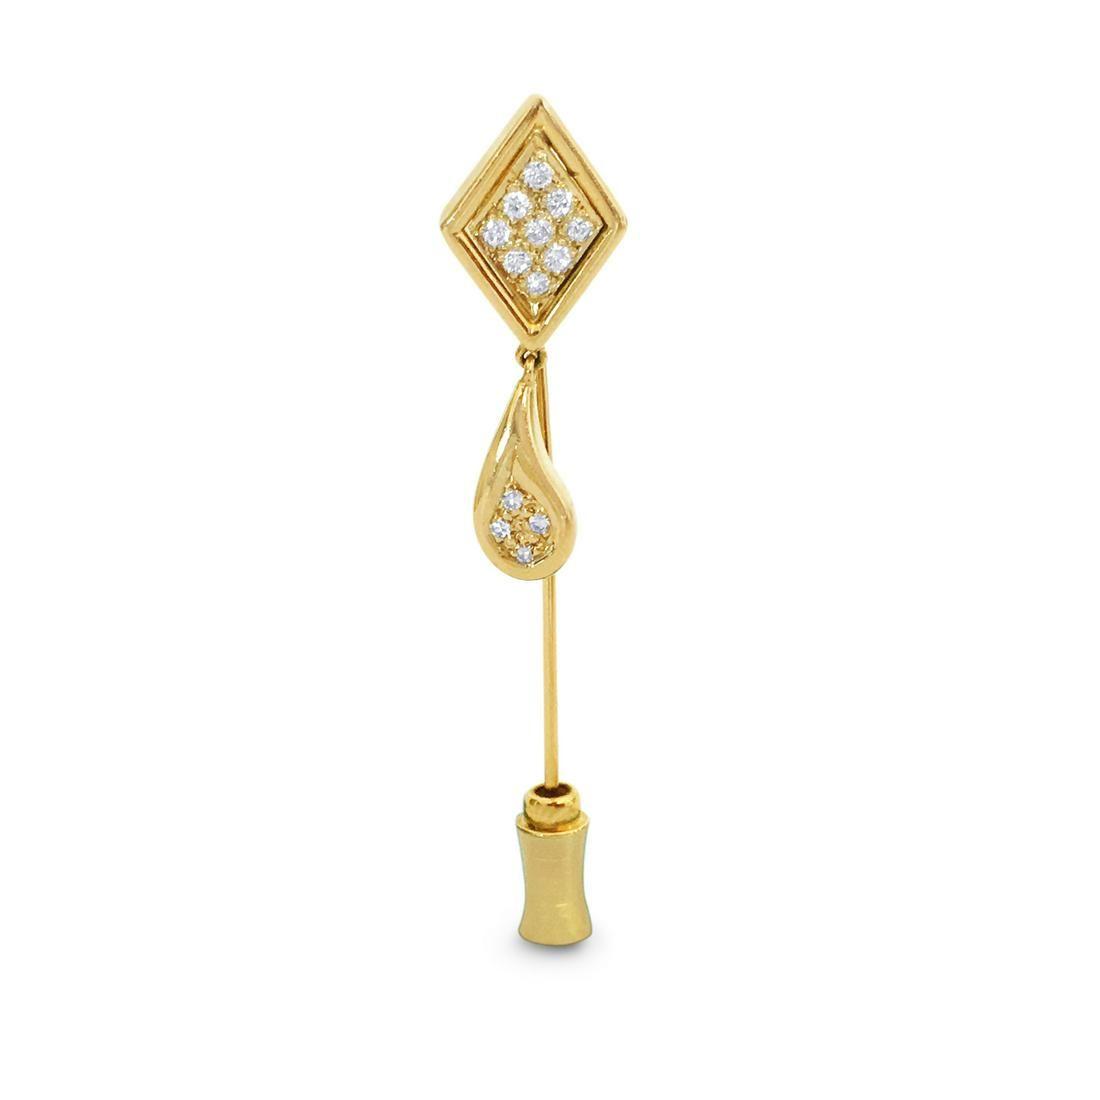 Womens, Vintage 14K Yellow Gold & Diamond Pin,